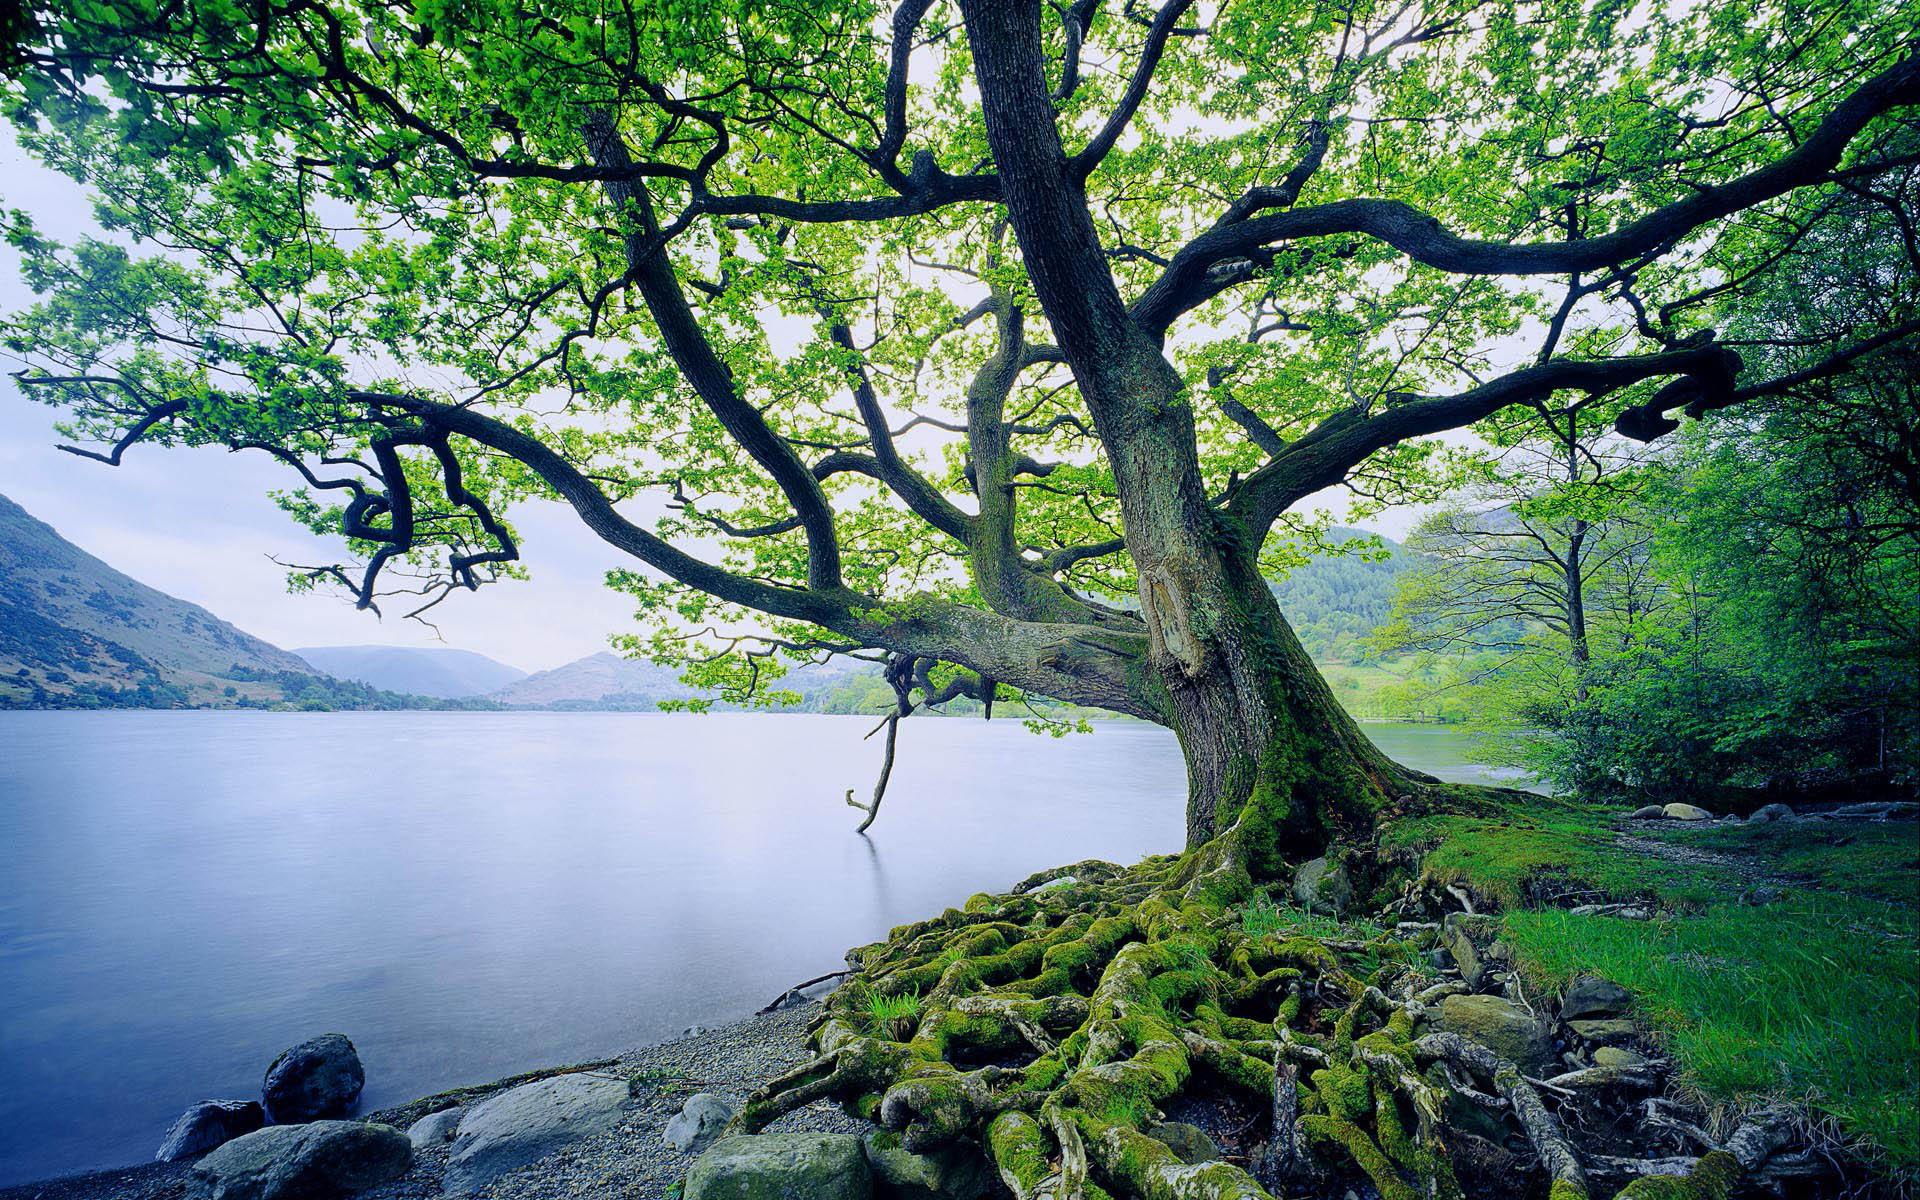 Oak Tree by Ullswater Lake, Lake District, Cumbria, England, UK